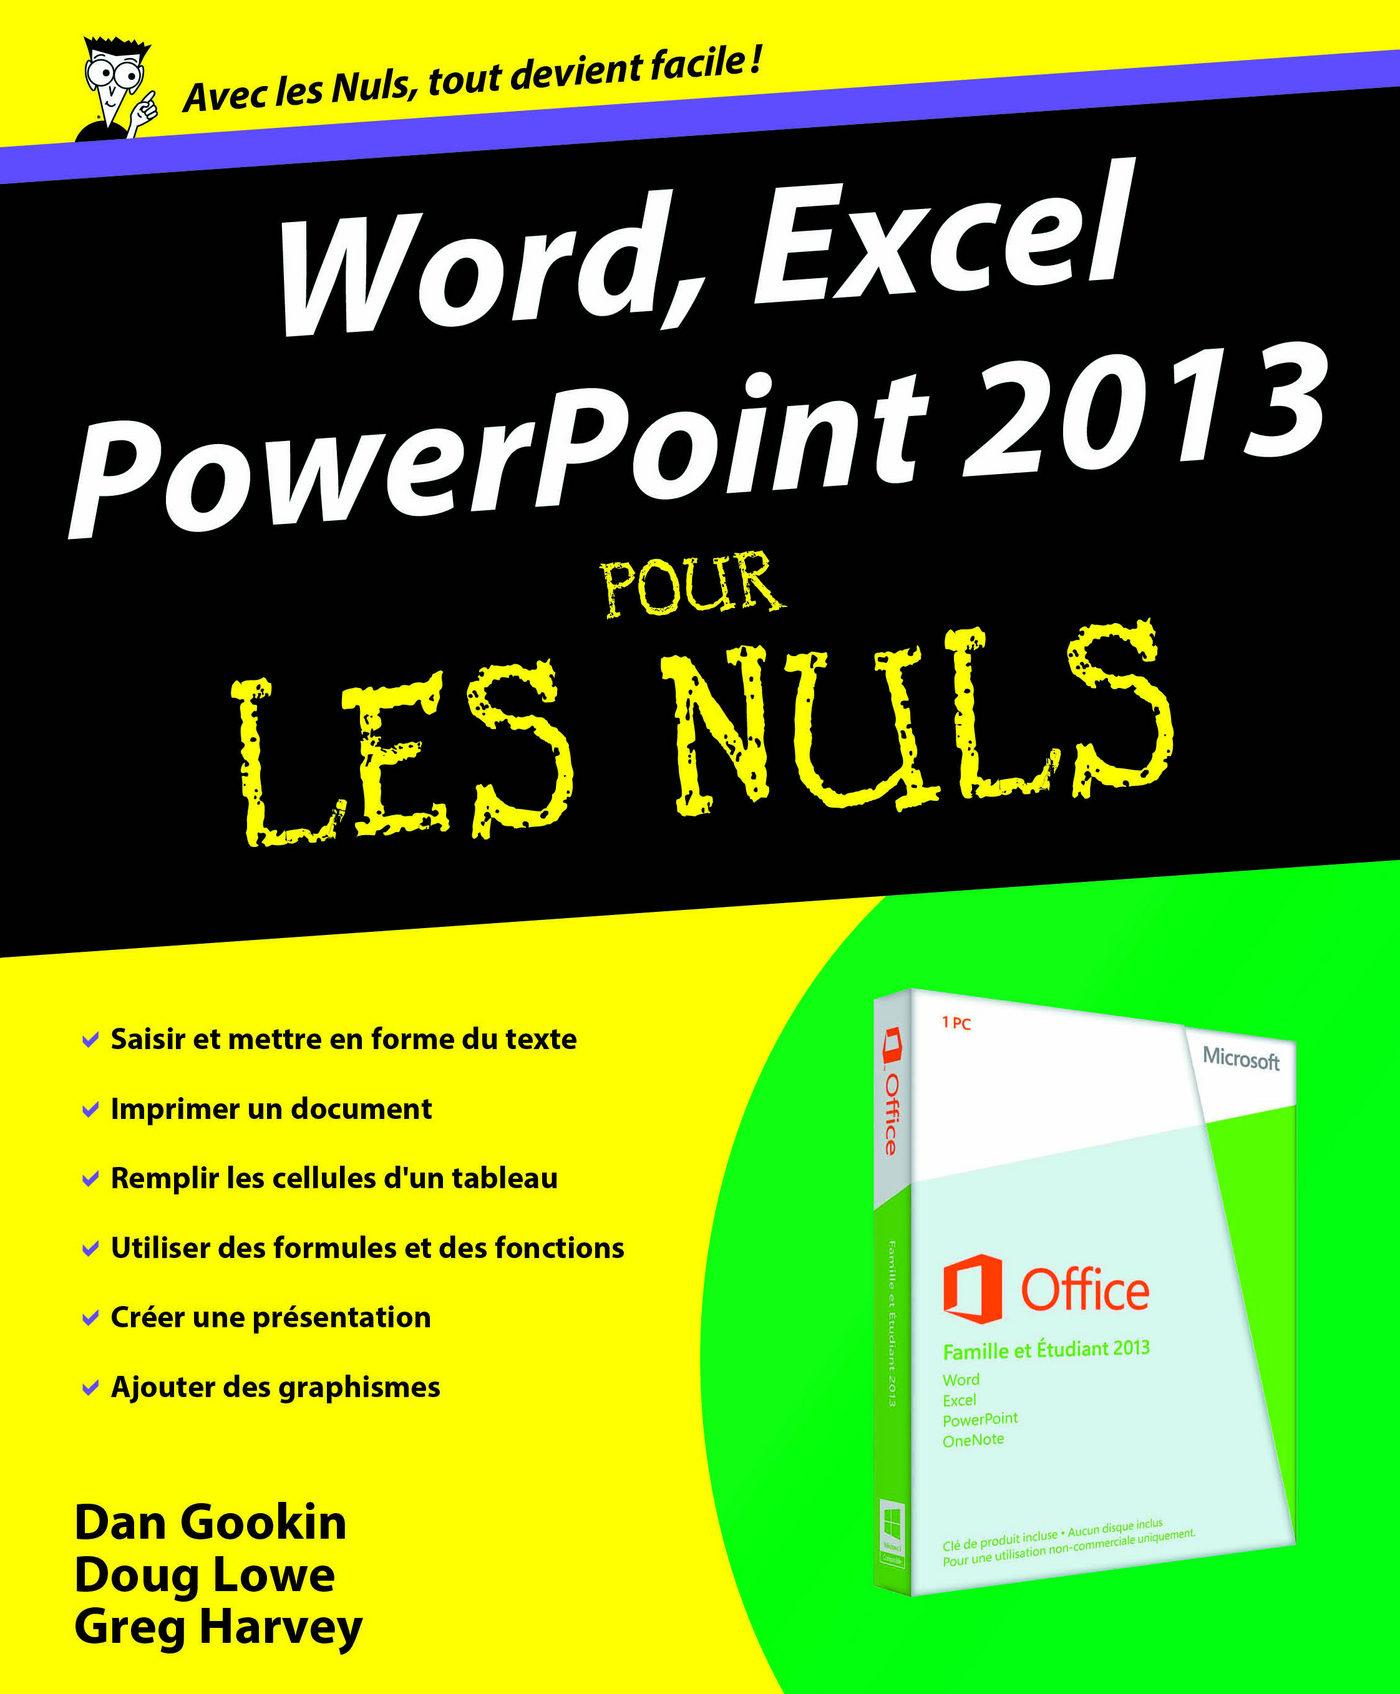 word excel powerpoint 2013 pour les nuls ebook doug lowe